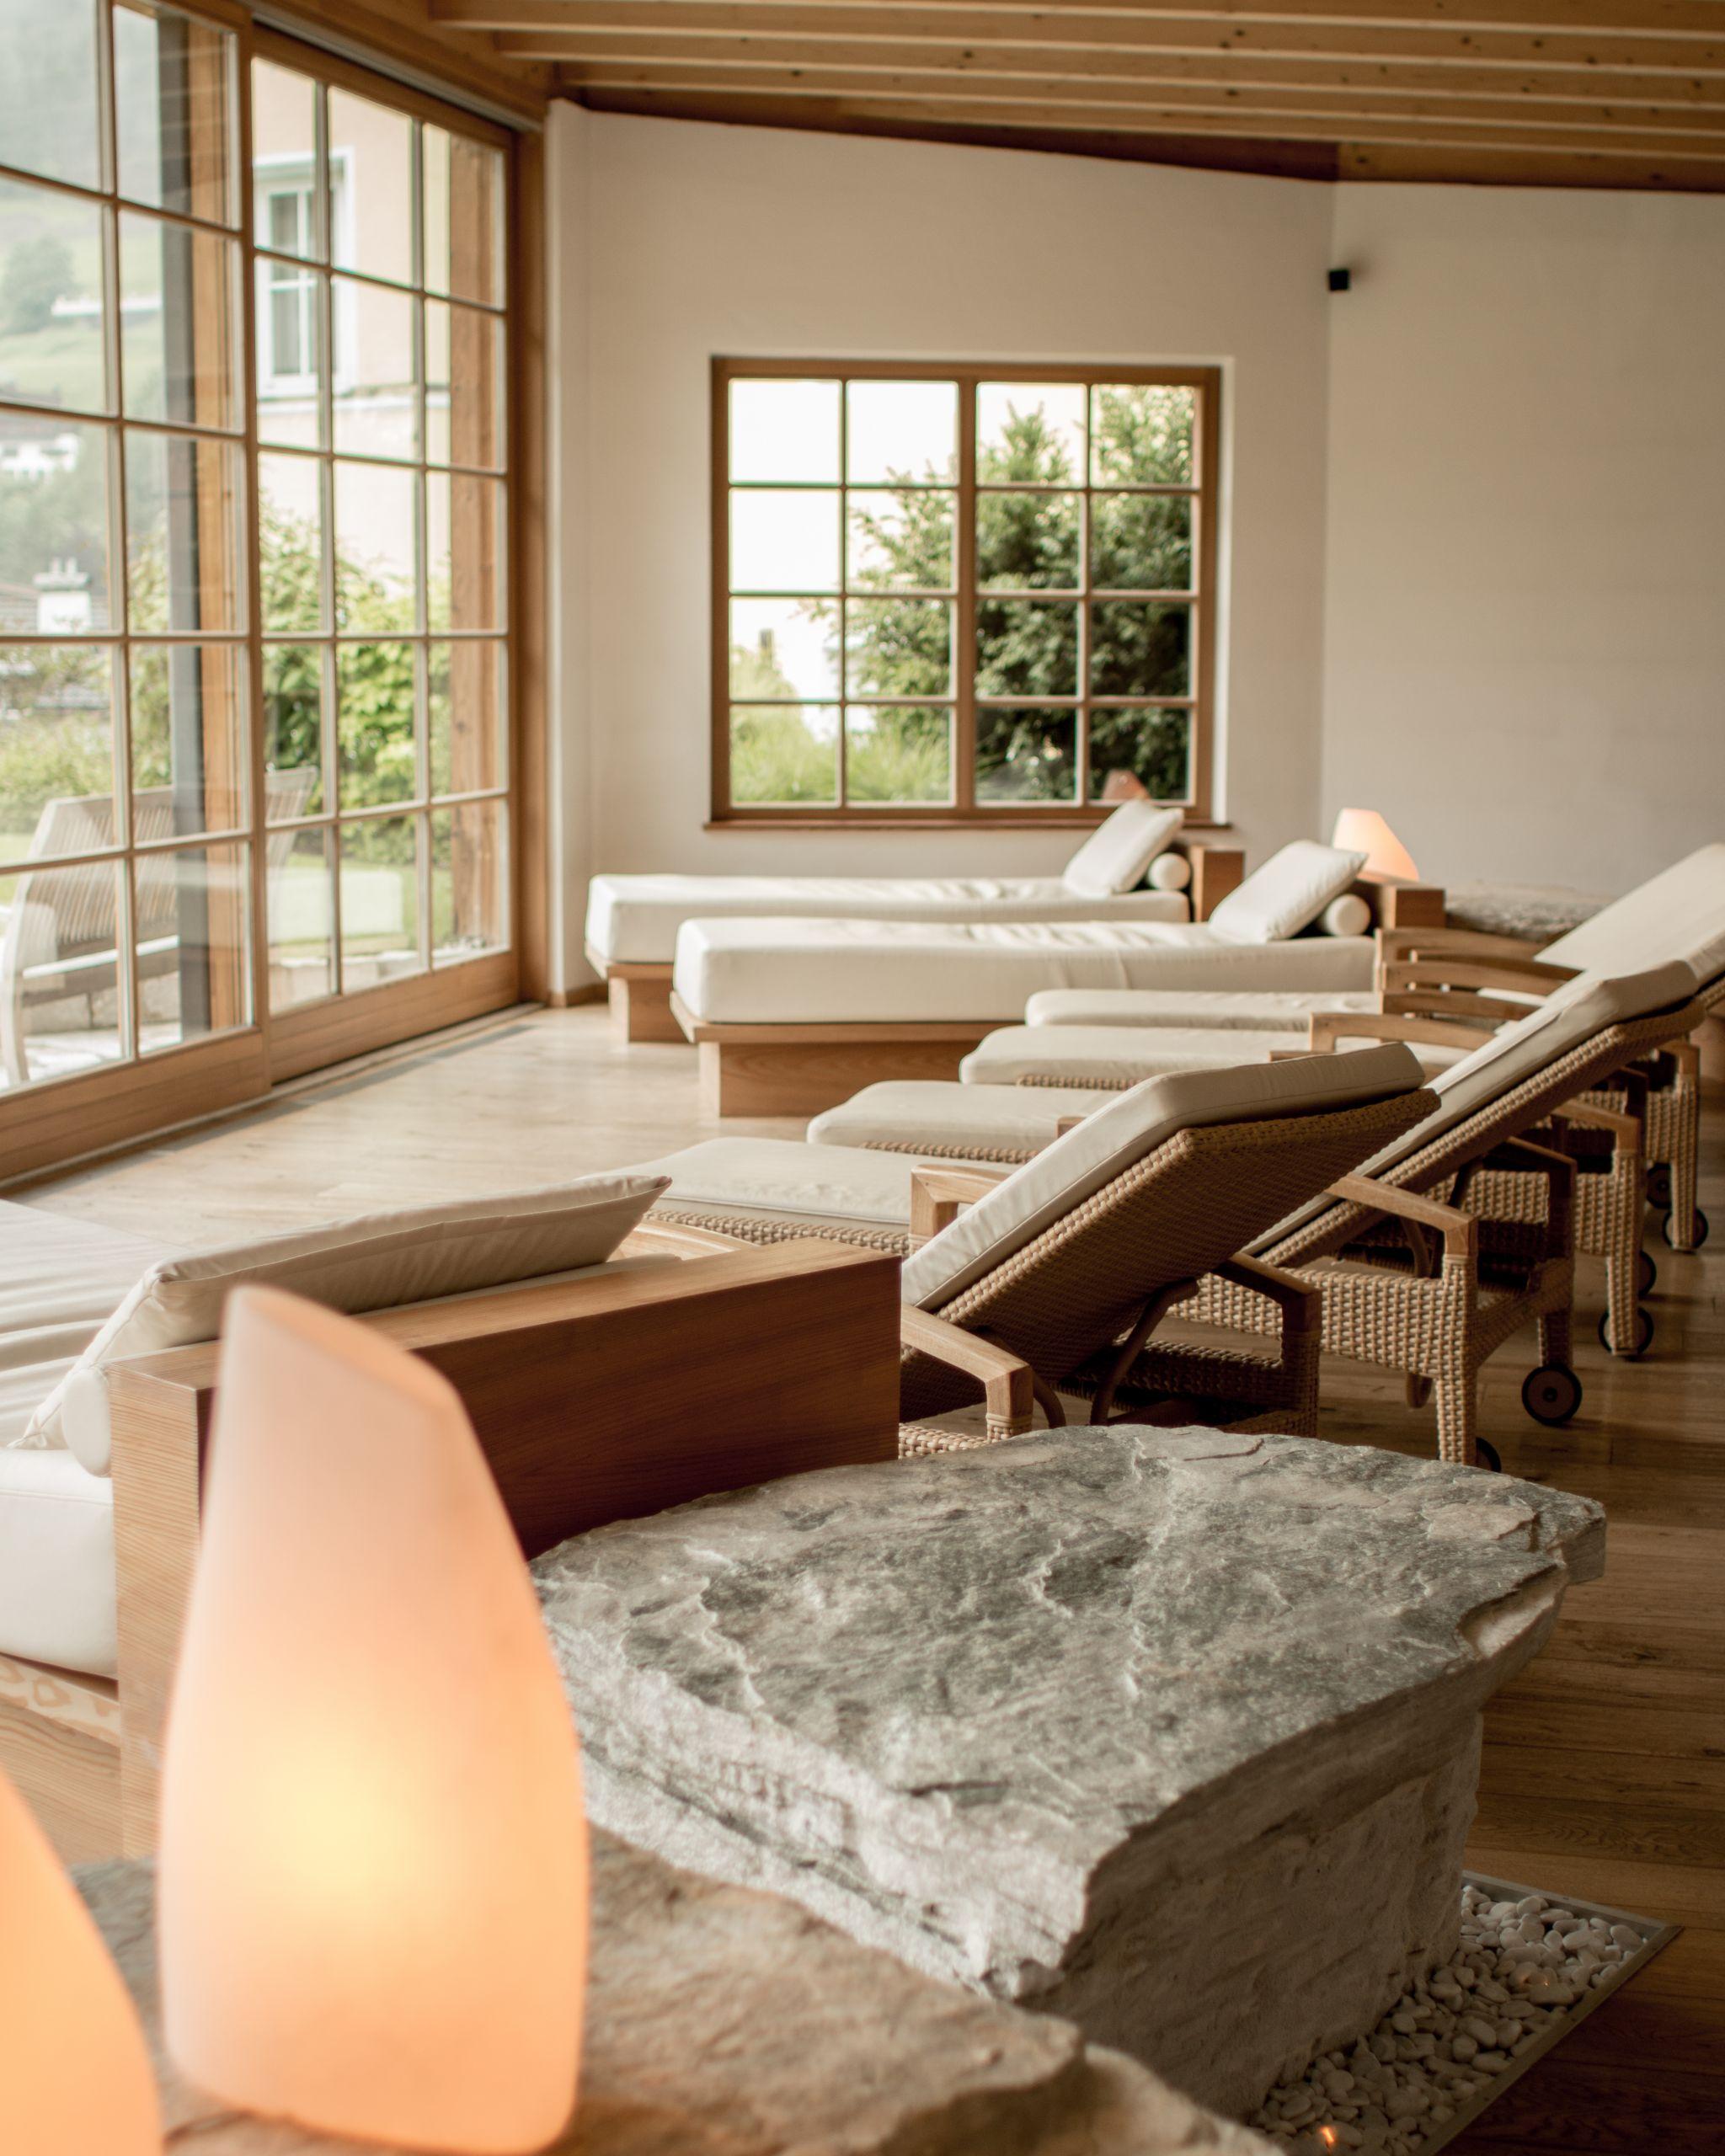 Adler Dolomites Hotel Ortisei Italy Hotel Hospitality Brand Photography Sauna